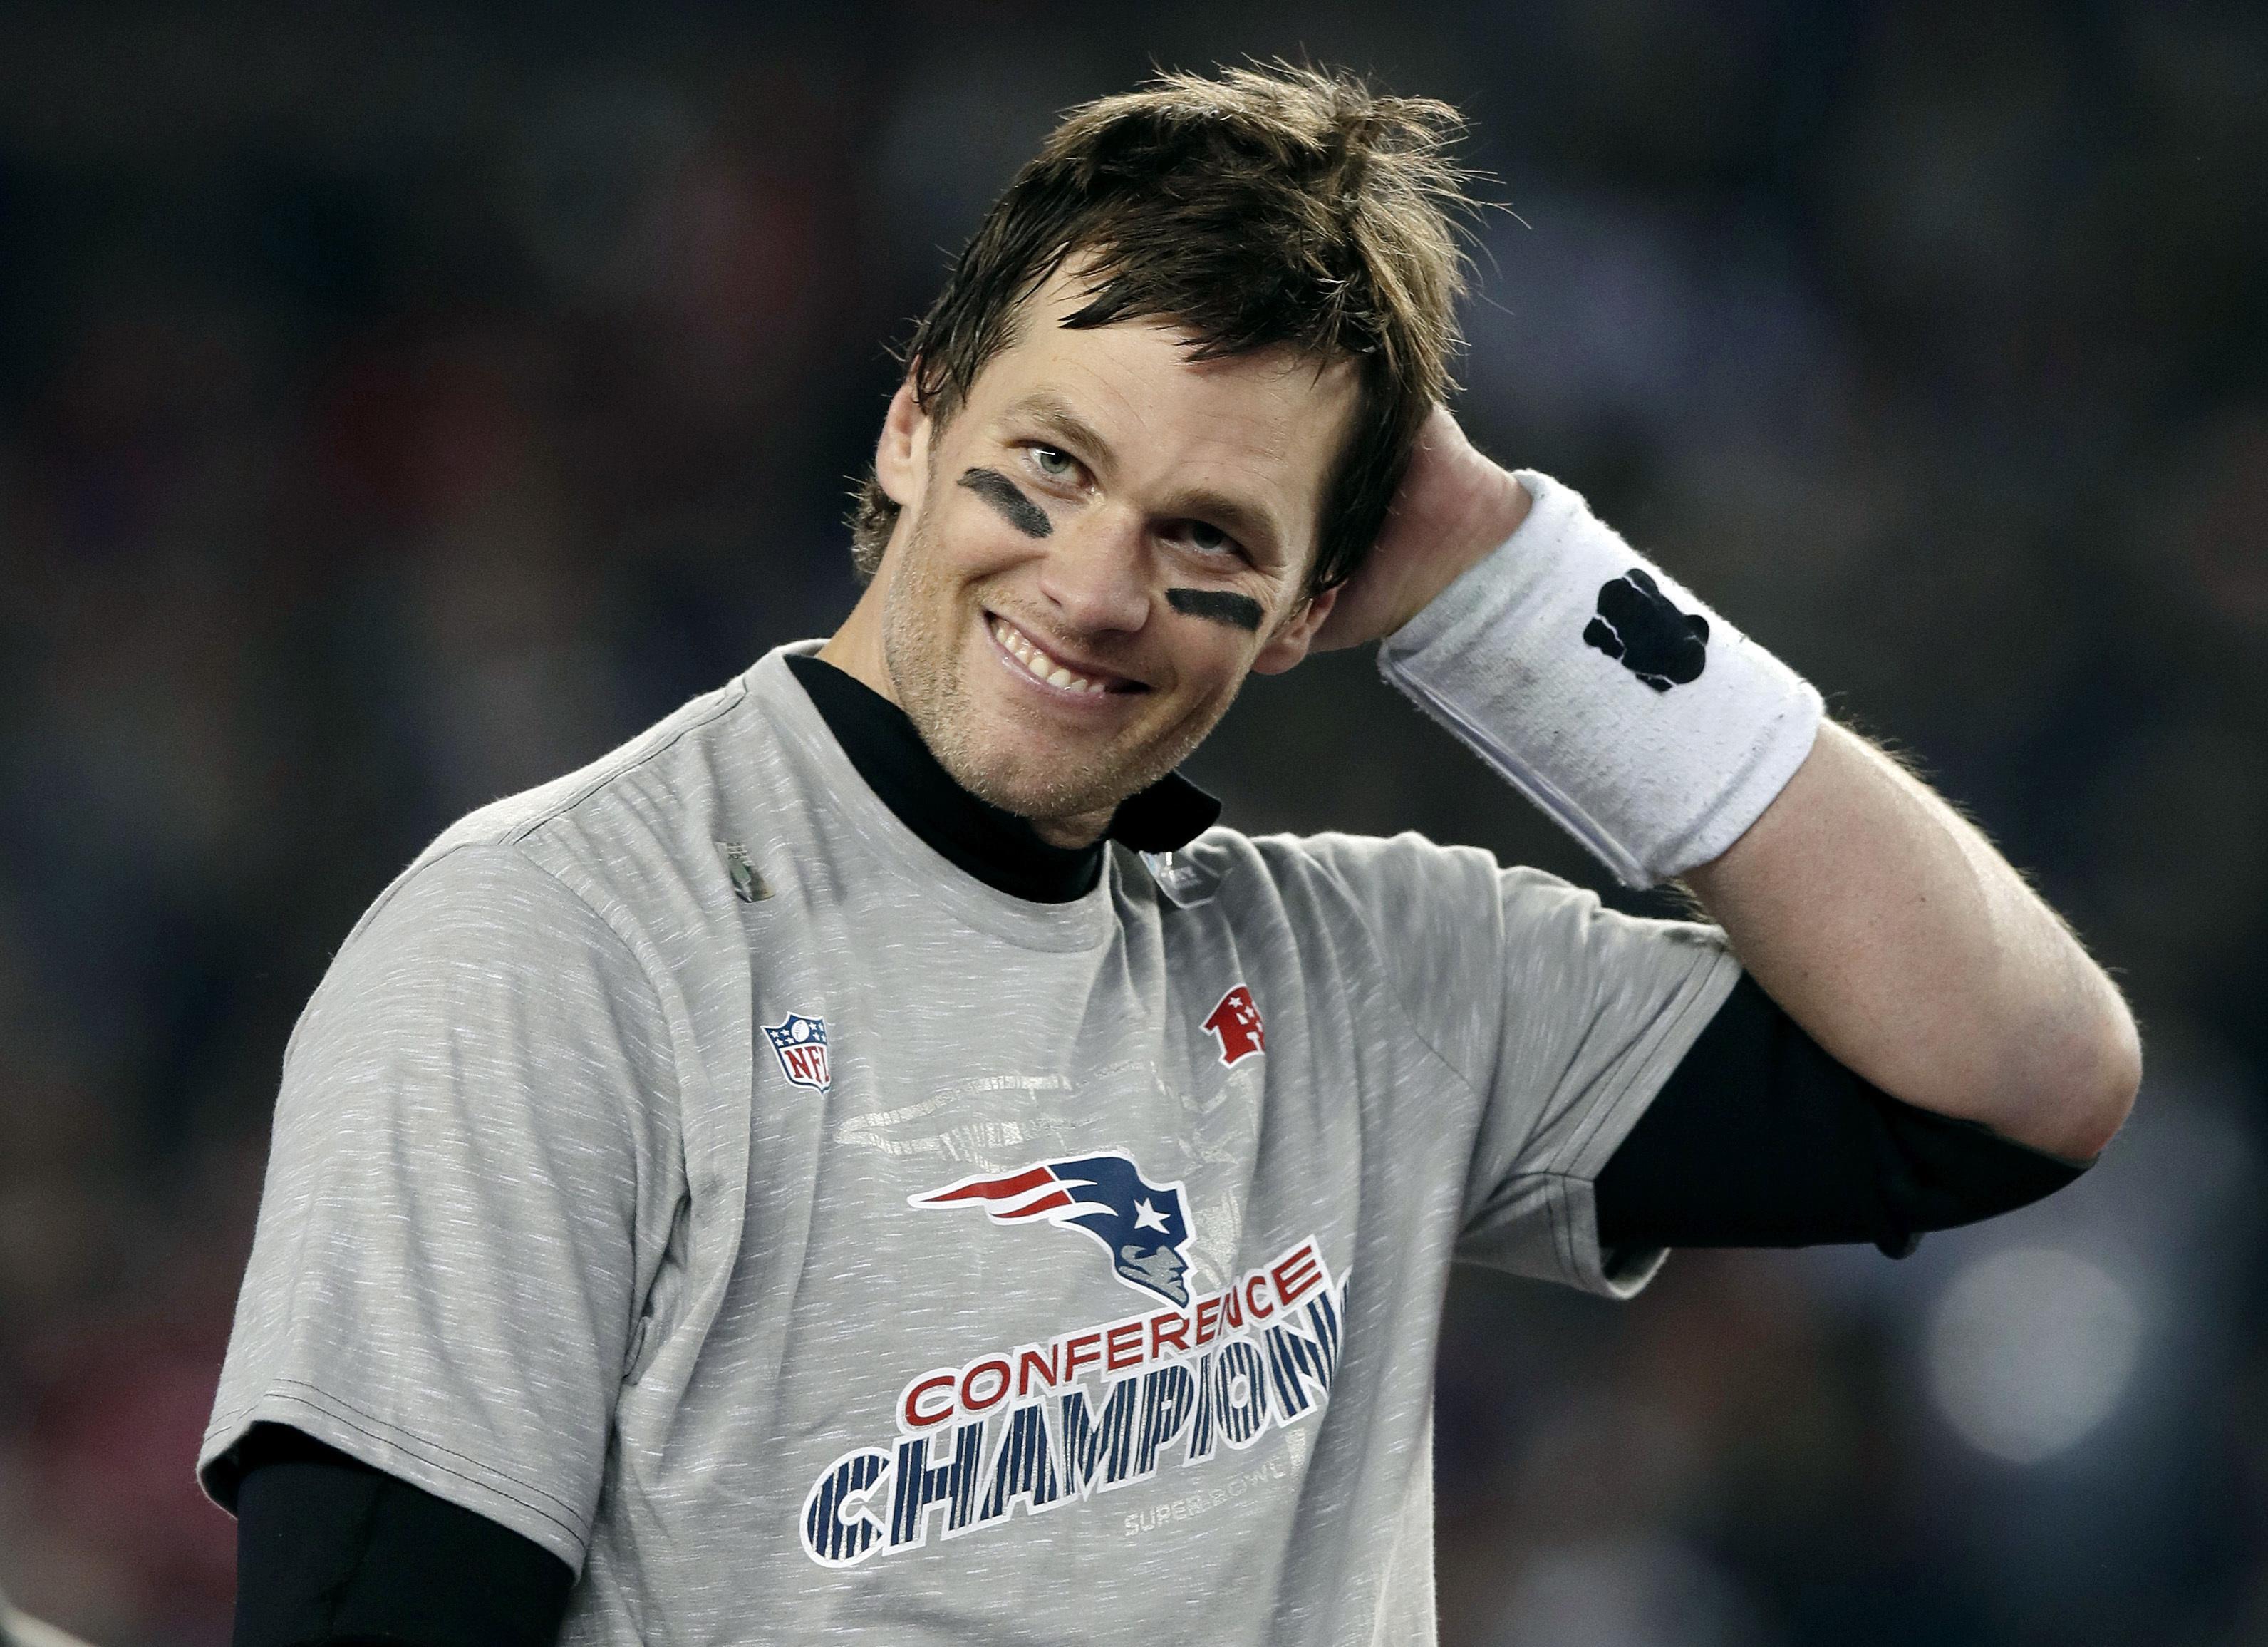 Tom Brady celebrated turning 41 on Friday